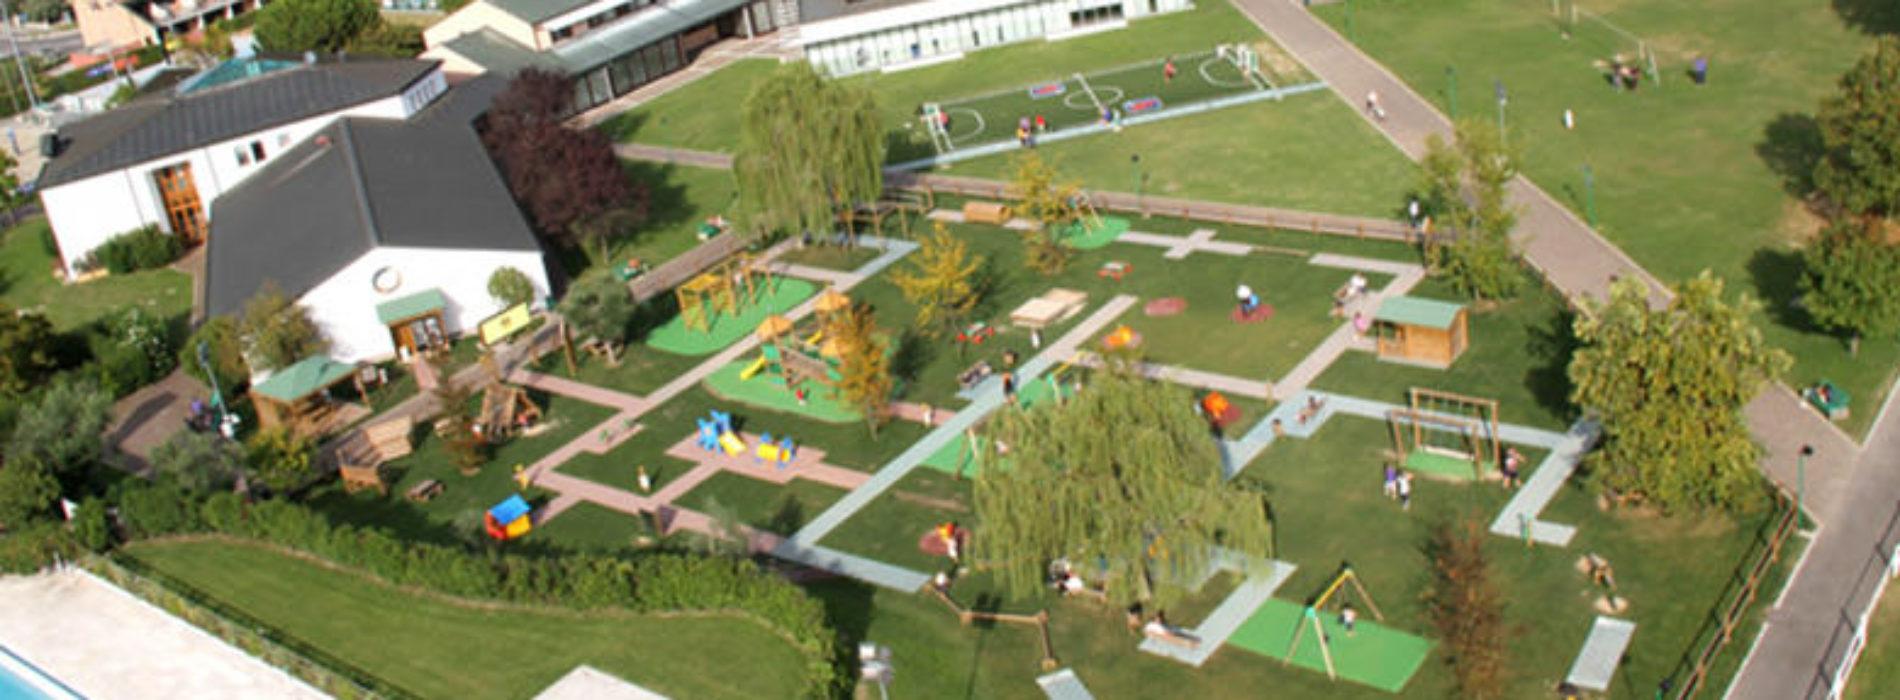 Aprirà a Bagnoli il Parco per l'Infanzia